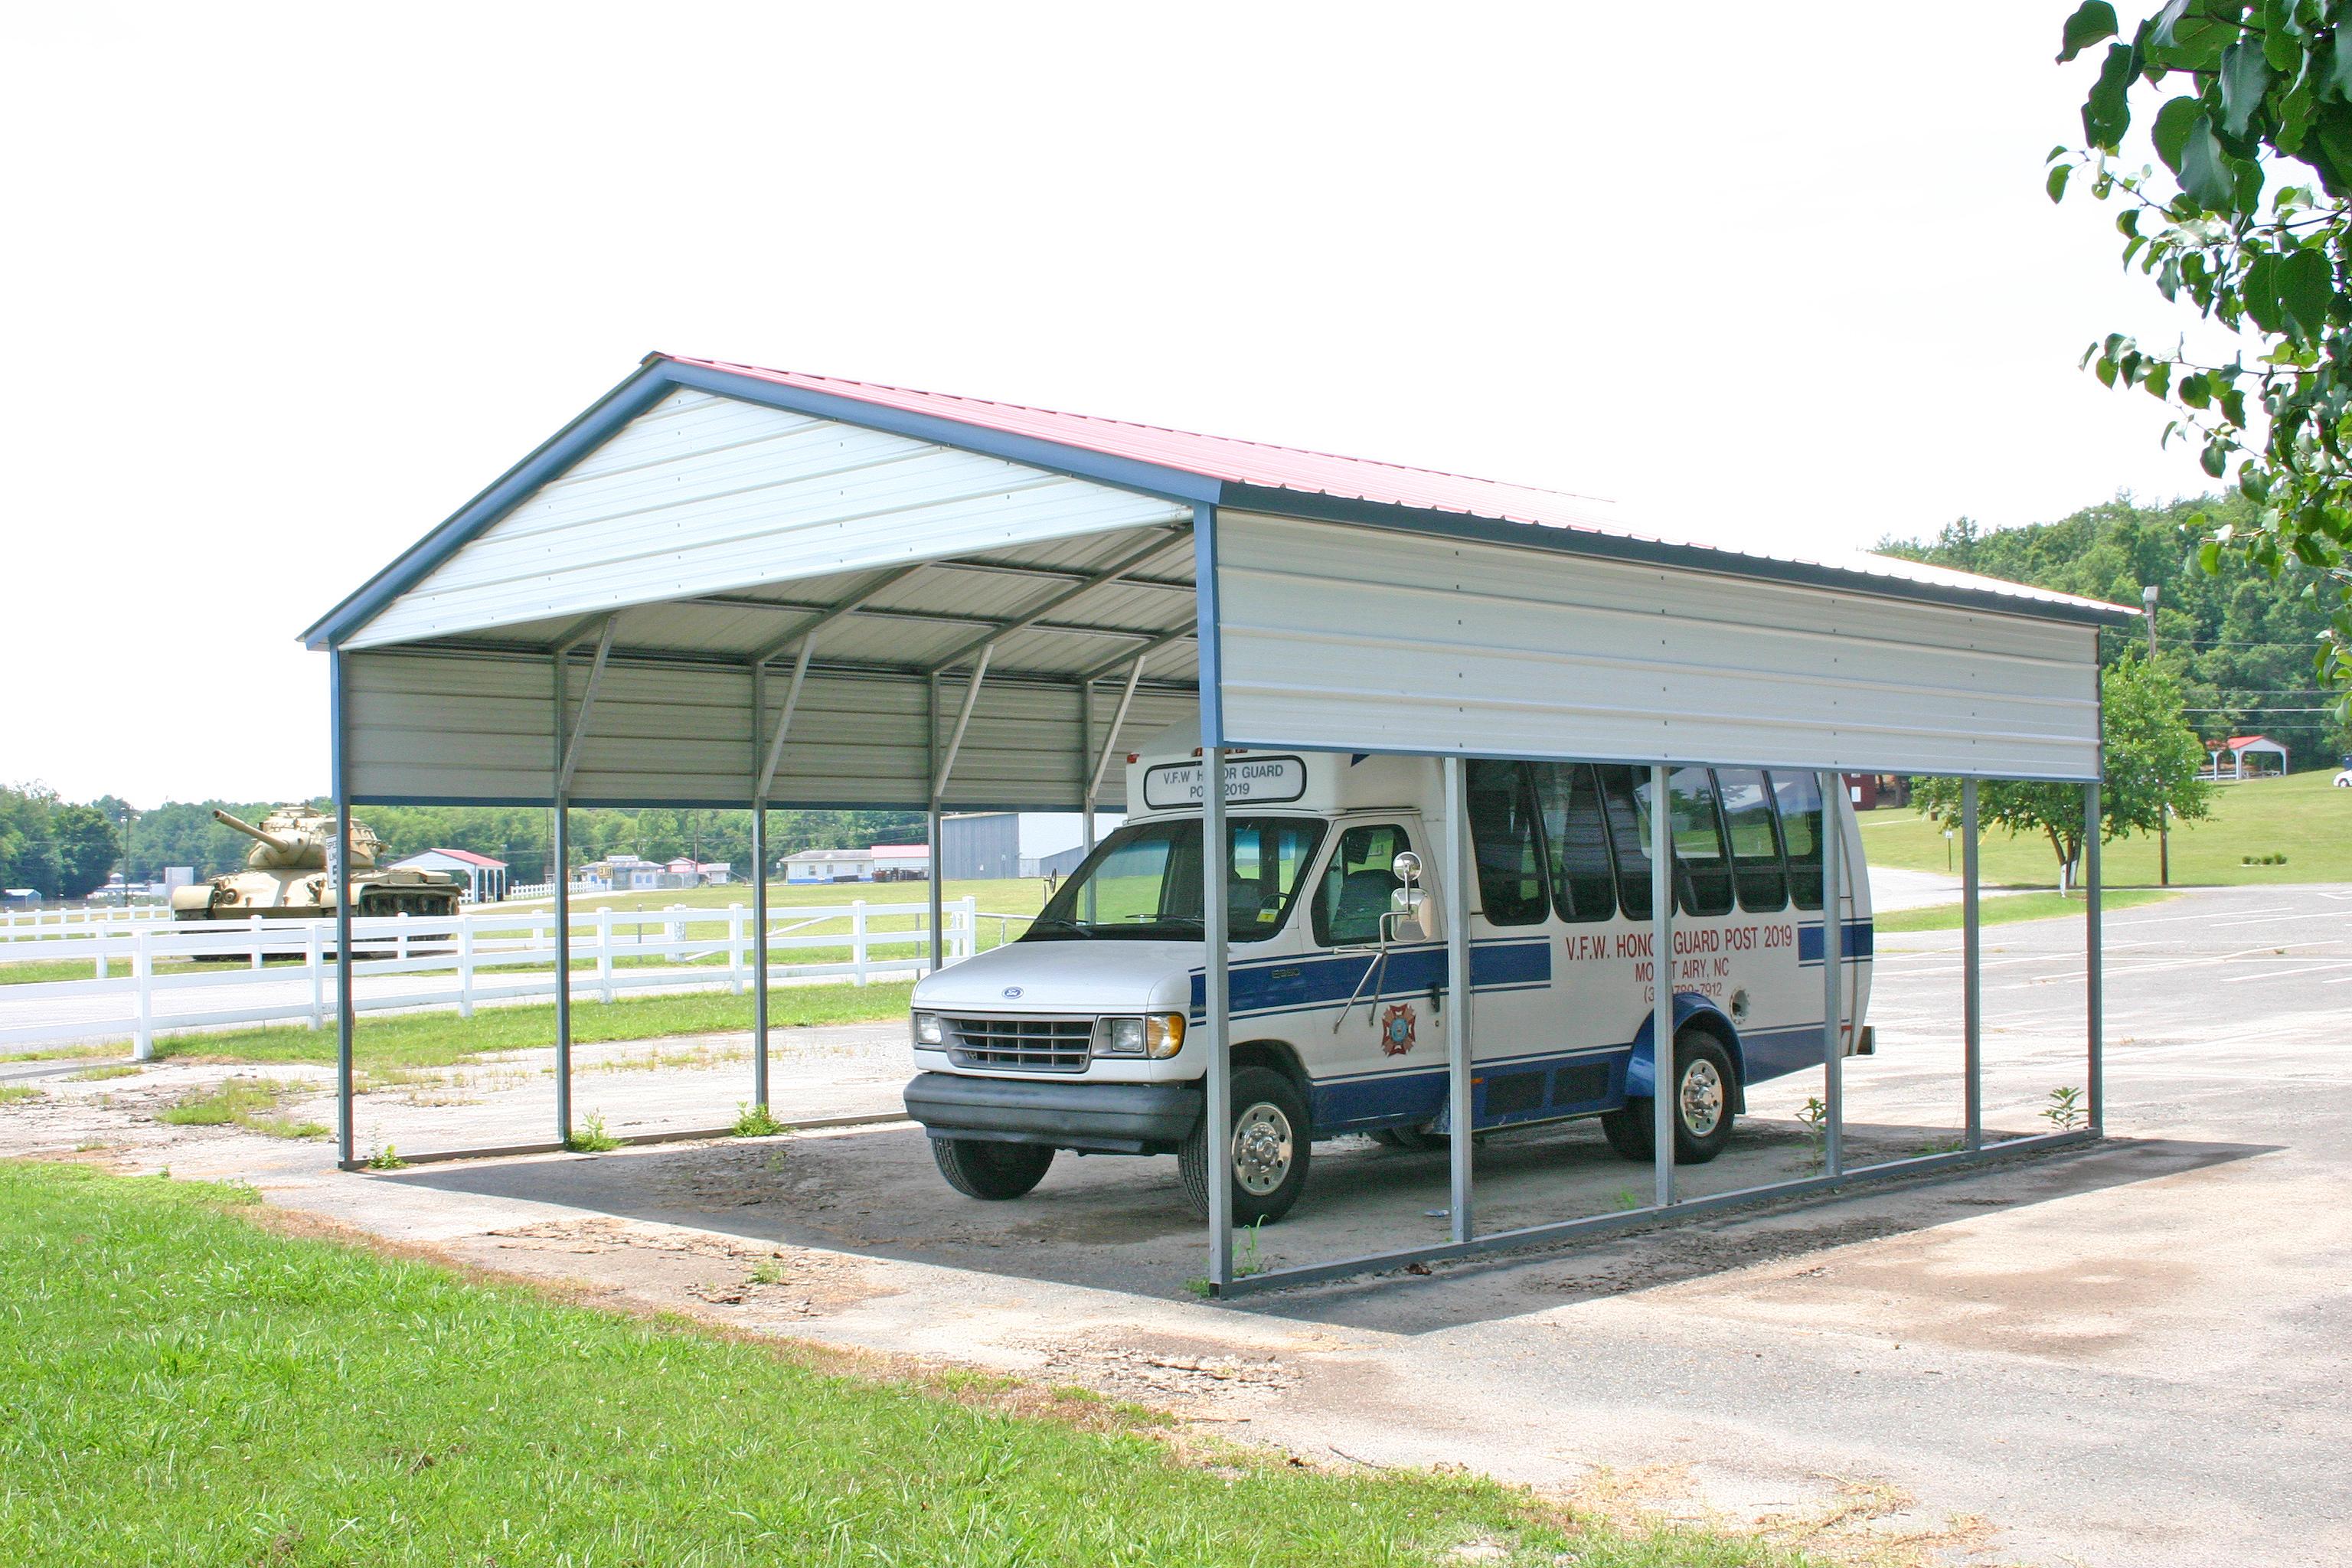 Garages Sheds Jacksonville Fl metal carports yulee fl   yulee florida carports